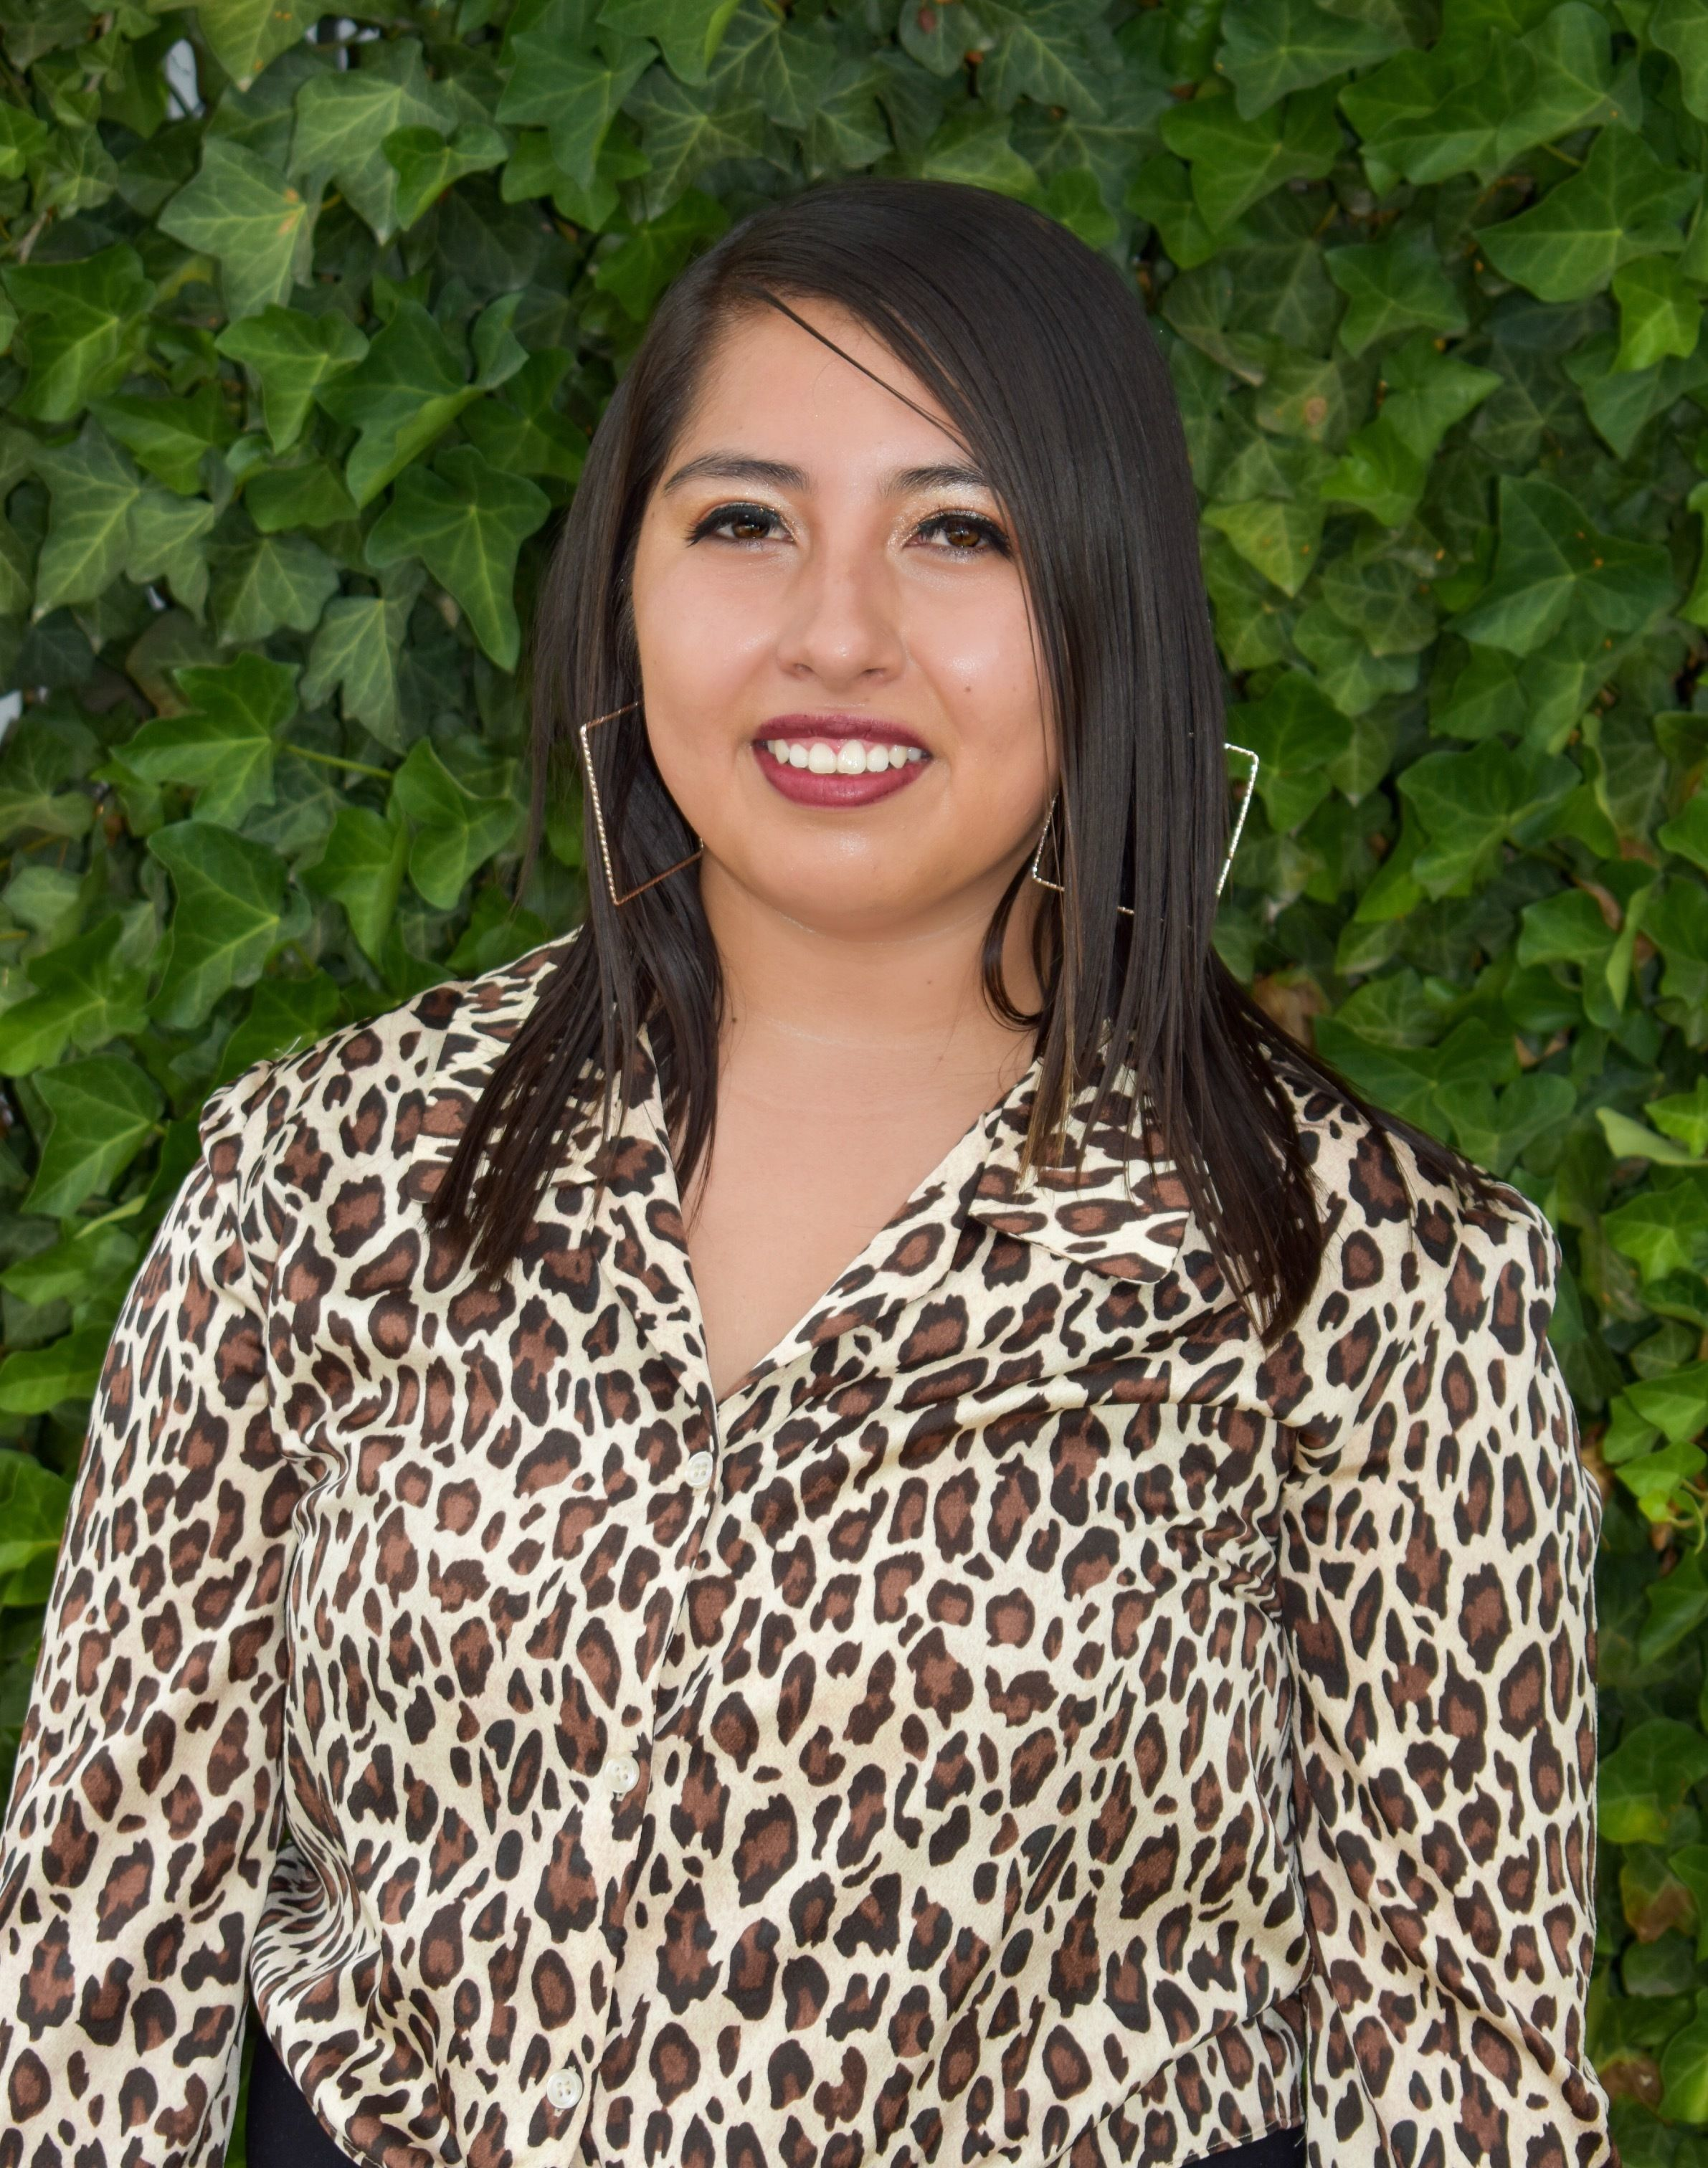 Evelyn Gutierrez